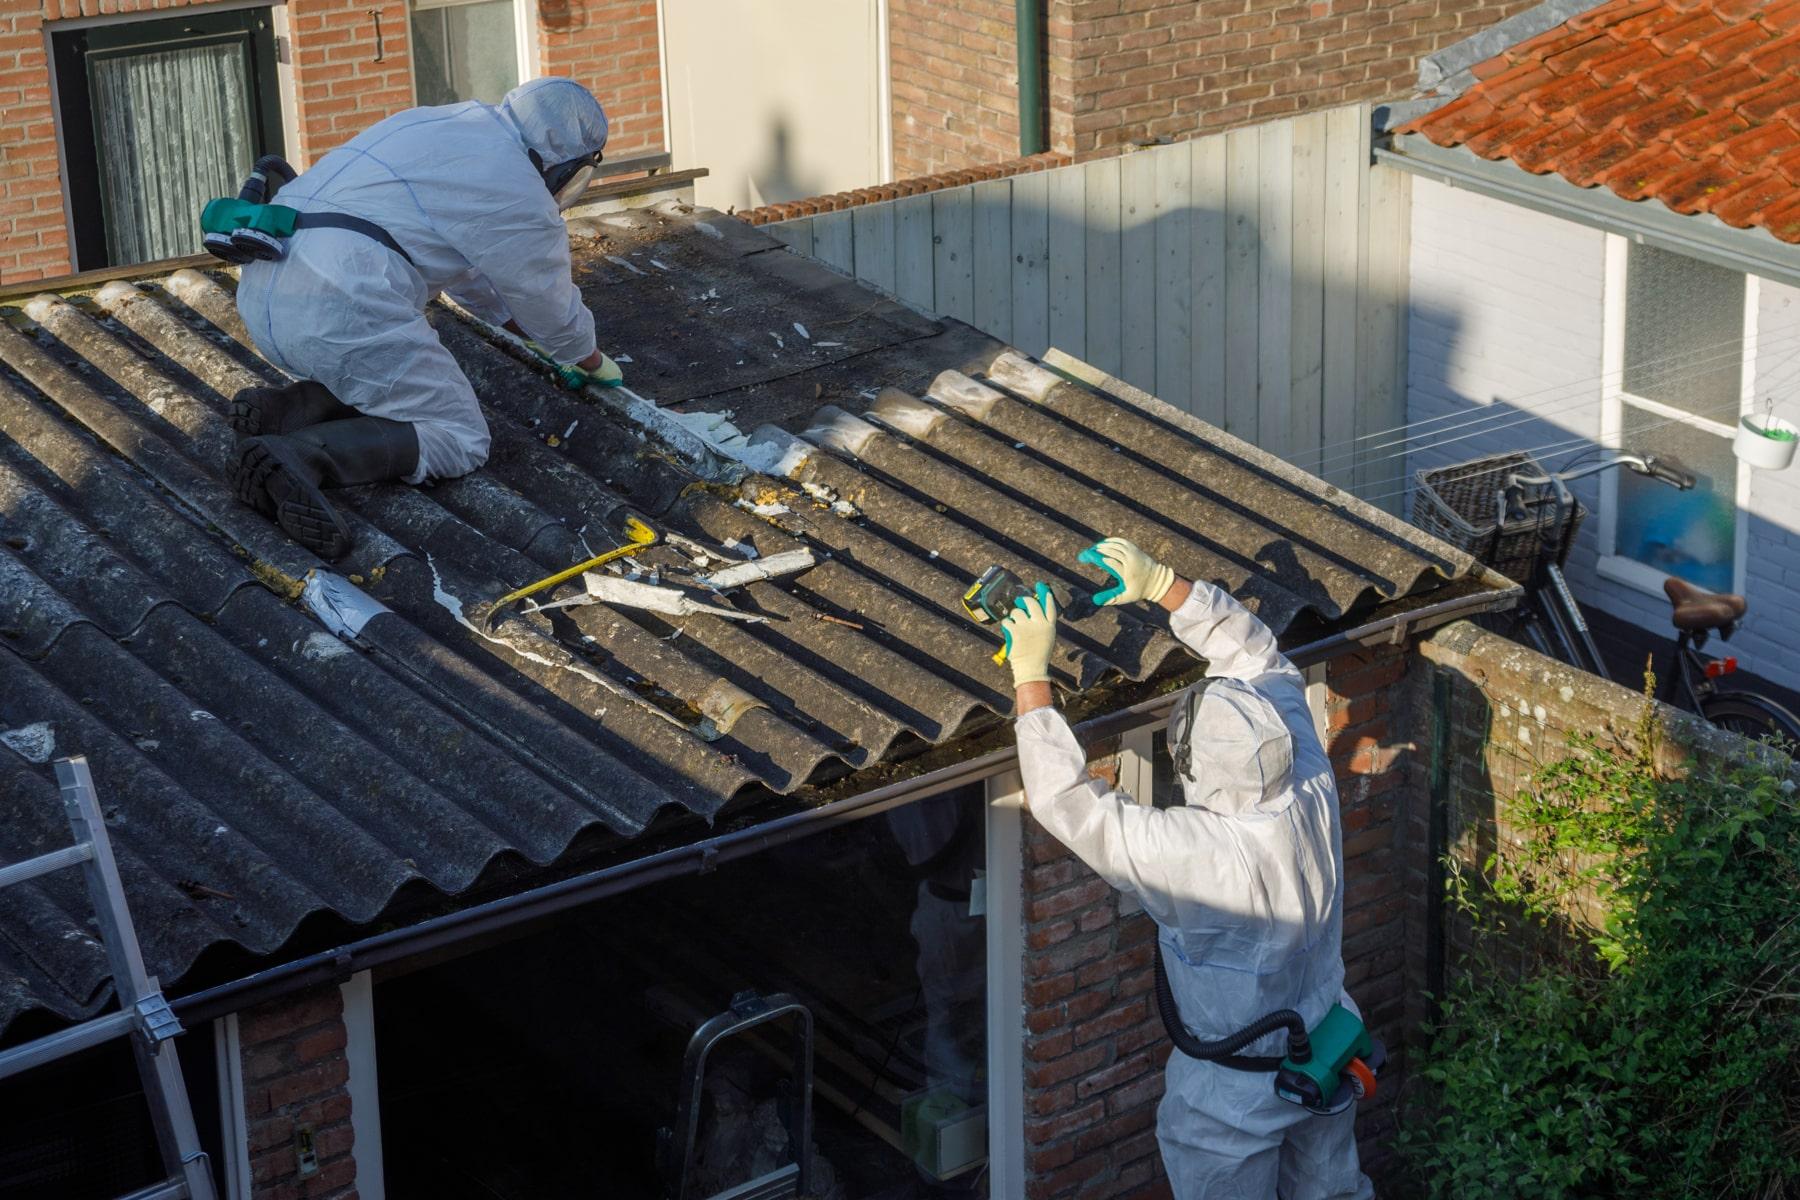 Asbestos company local to Ashtead